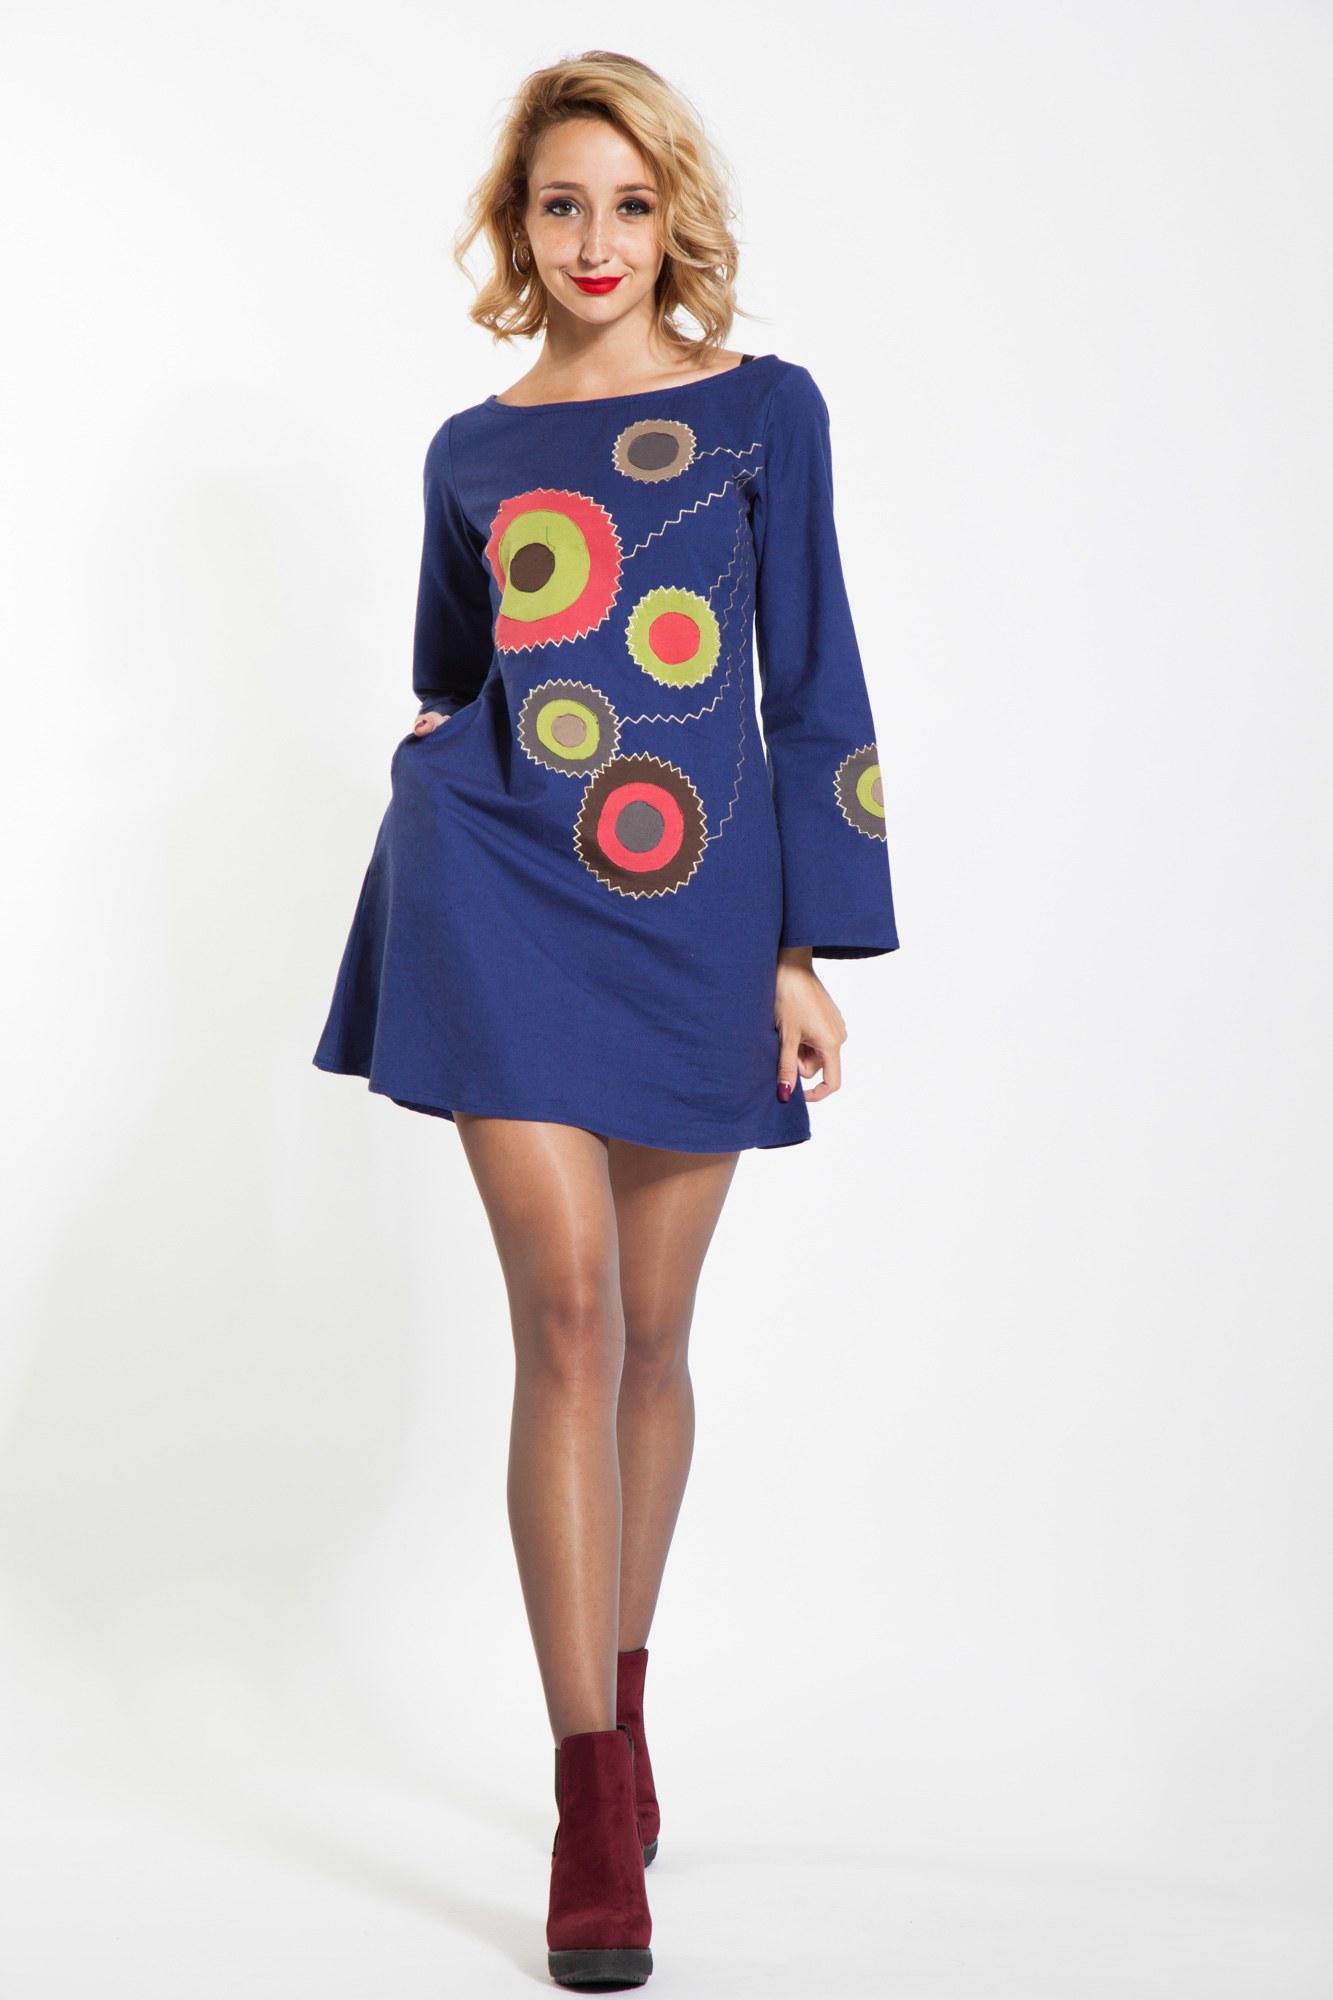 Rochie albastra scurta Kroga aplicatie cercuri